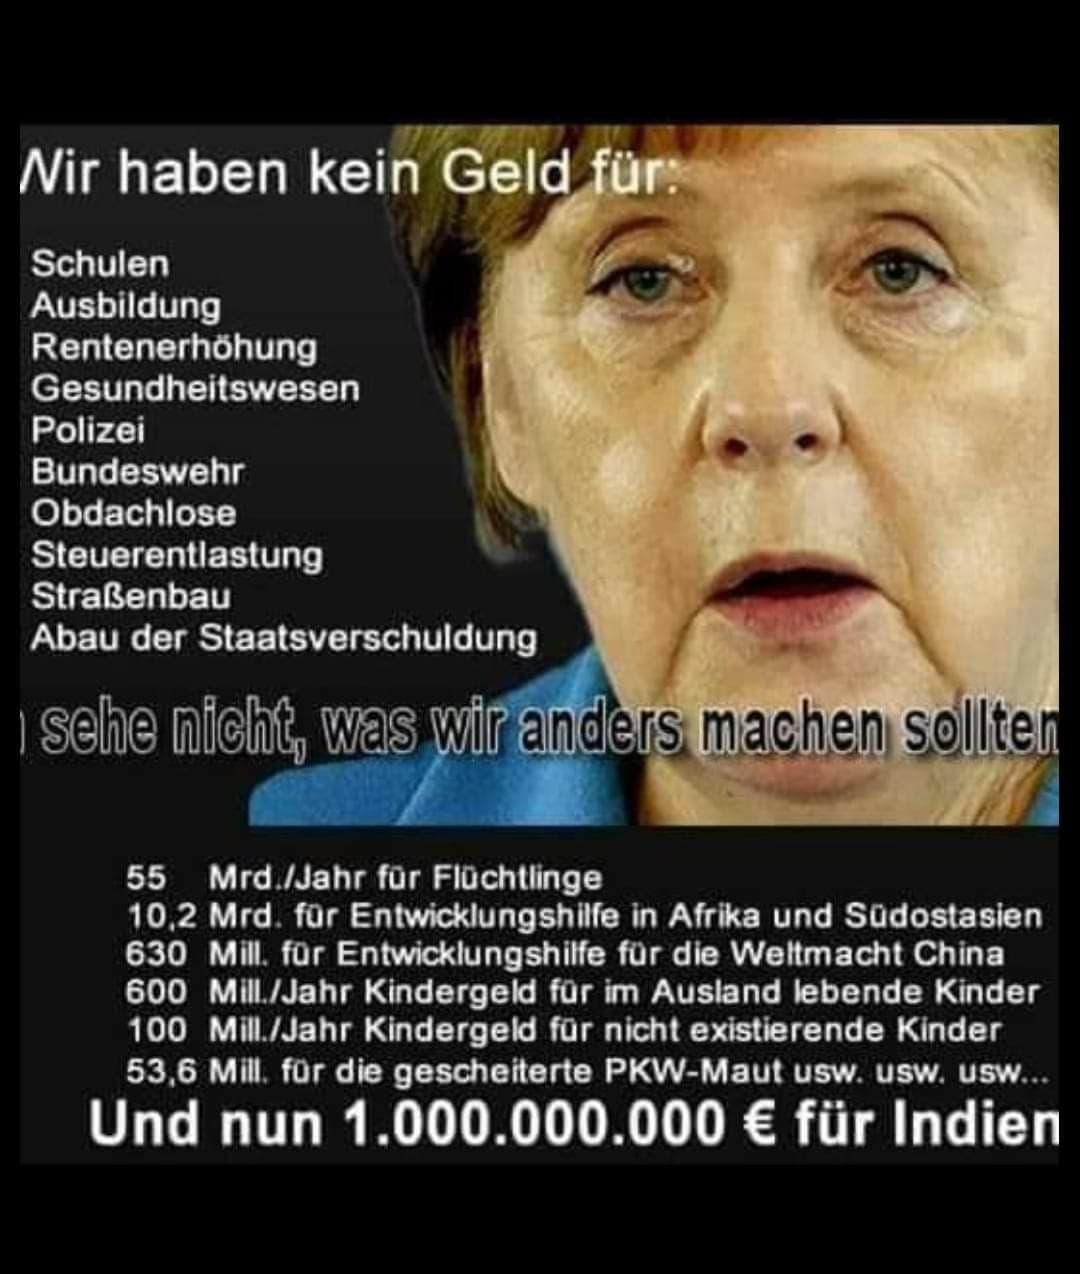 Merkels Bilanz